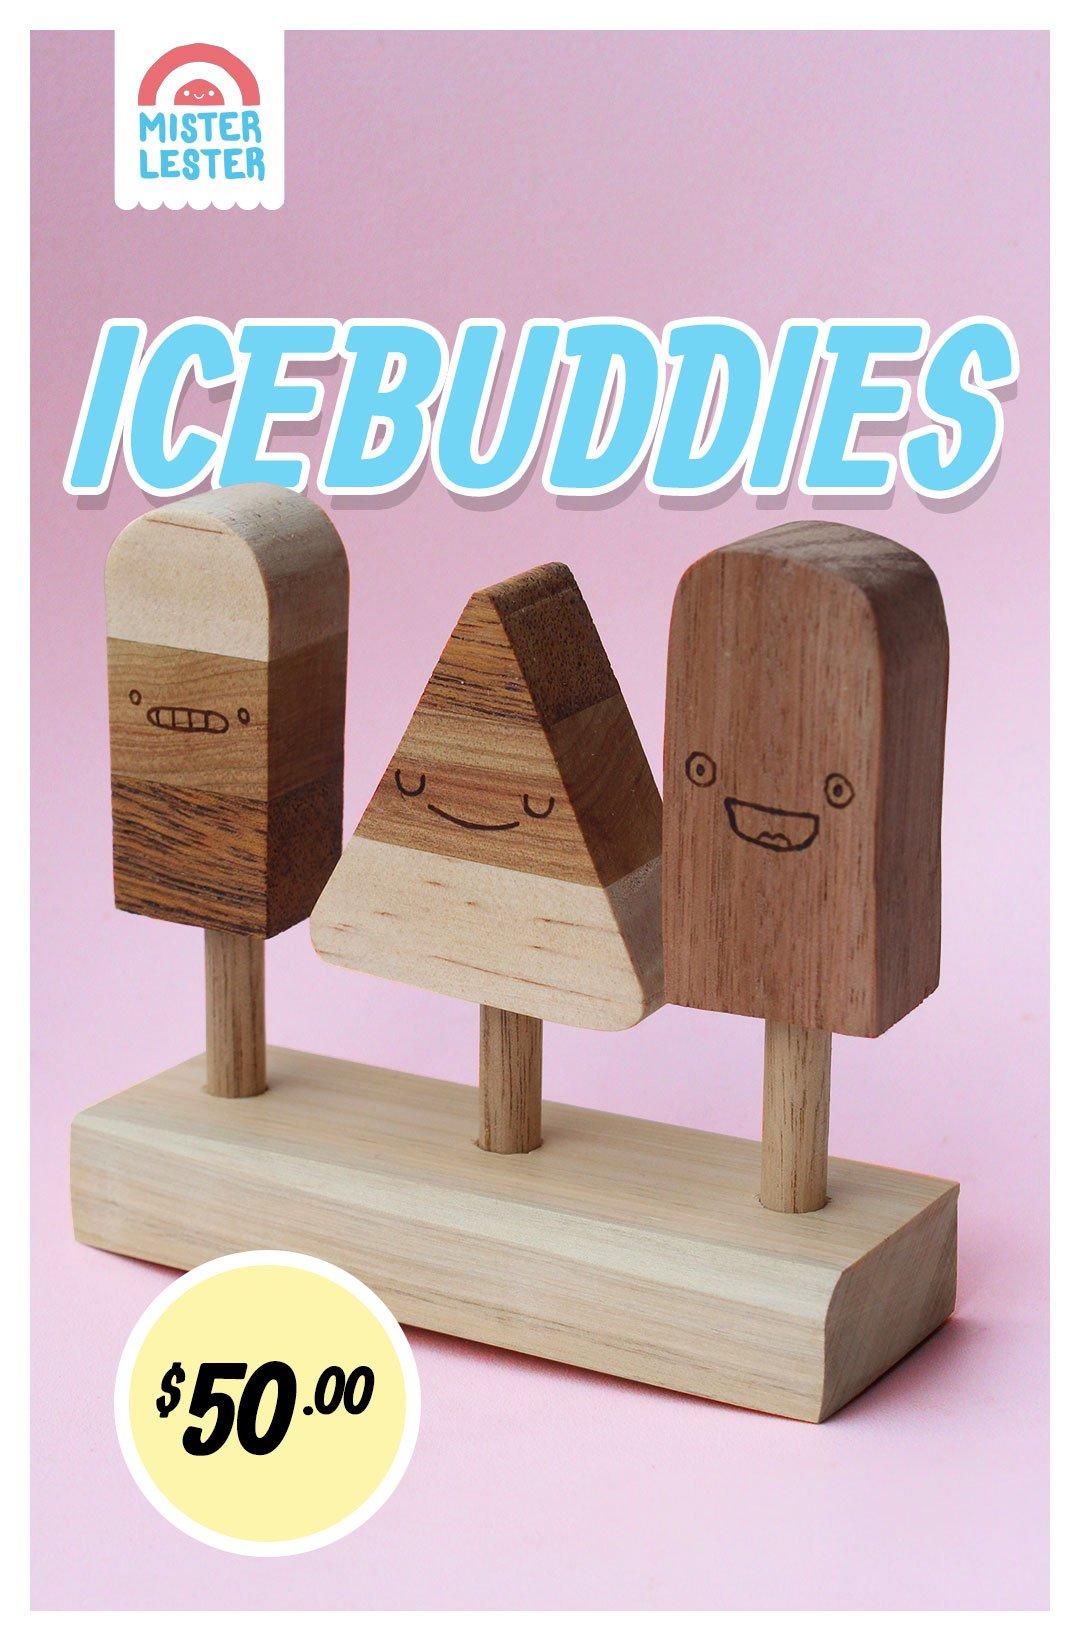 Image of Icebuddies